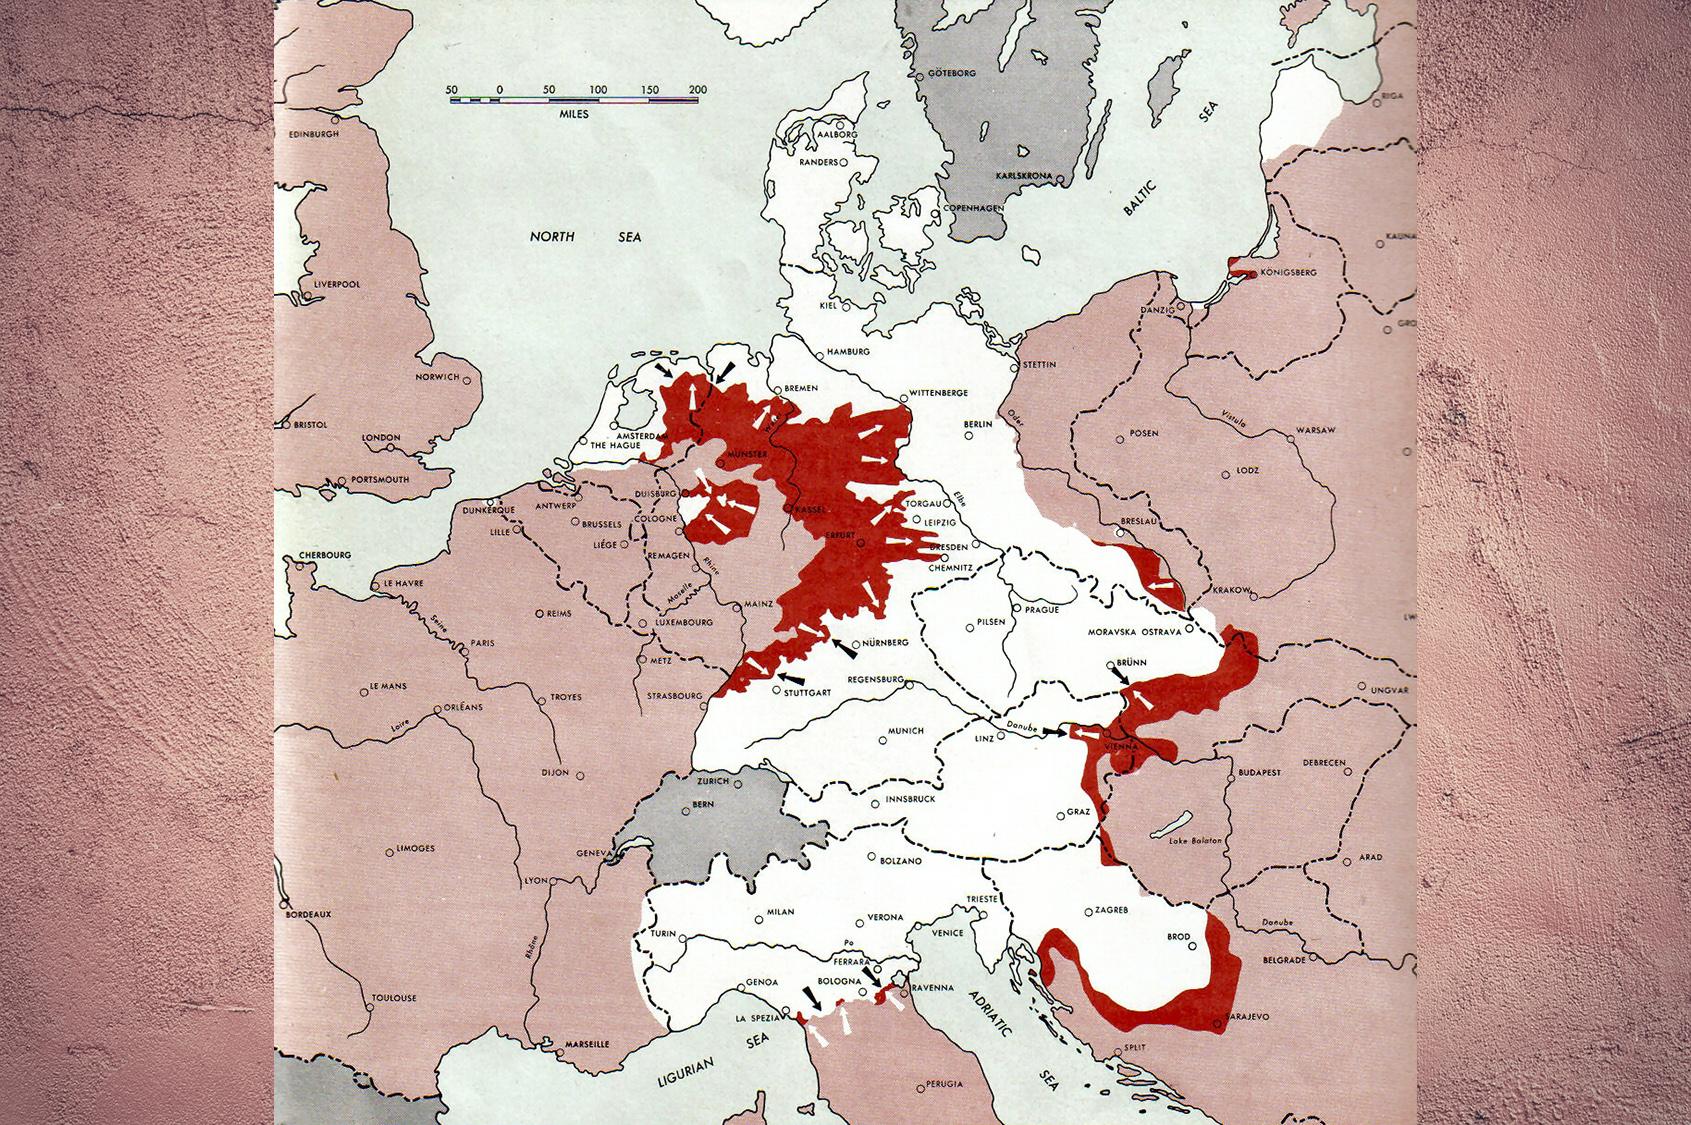 03_nemet_front_battlefront_nemetorszag_germany_deutschland_1945_04_15_forras-wikimedia.jpg